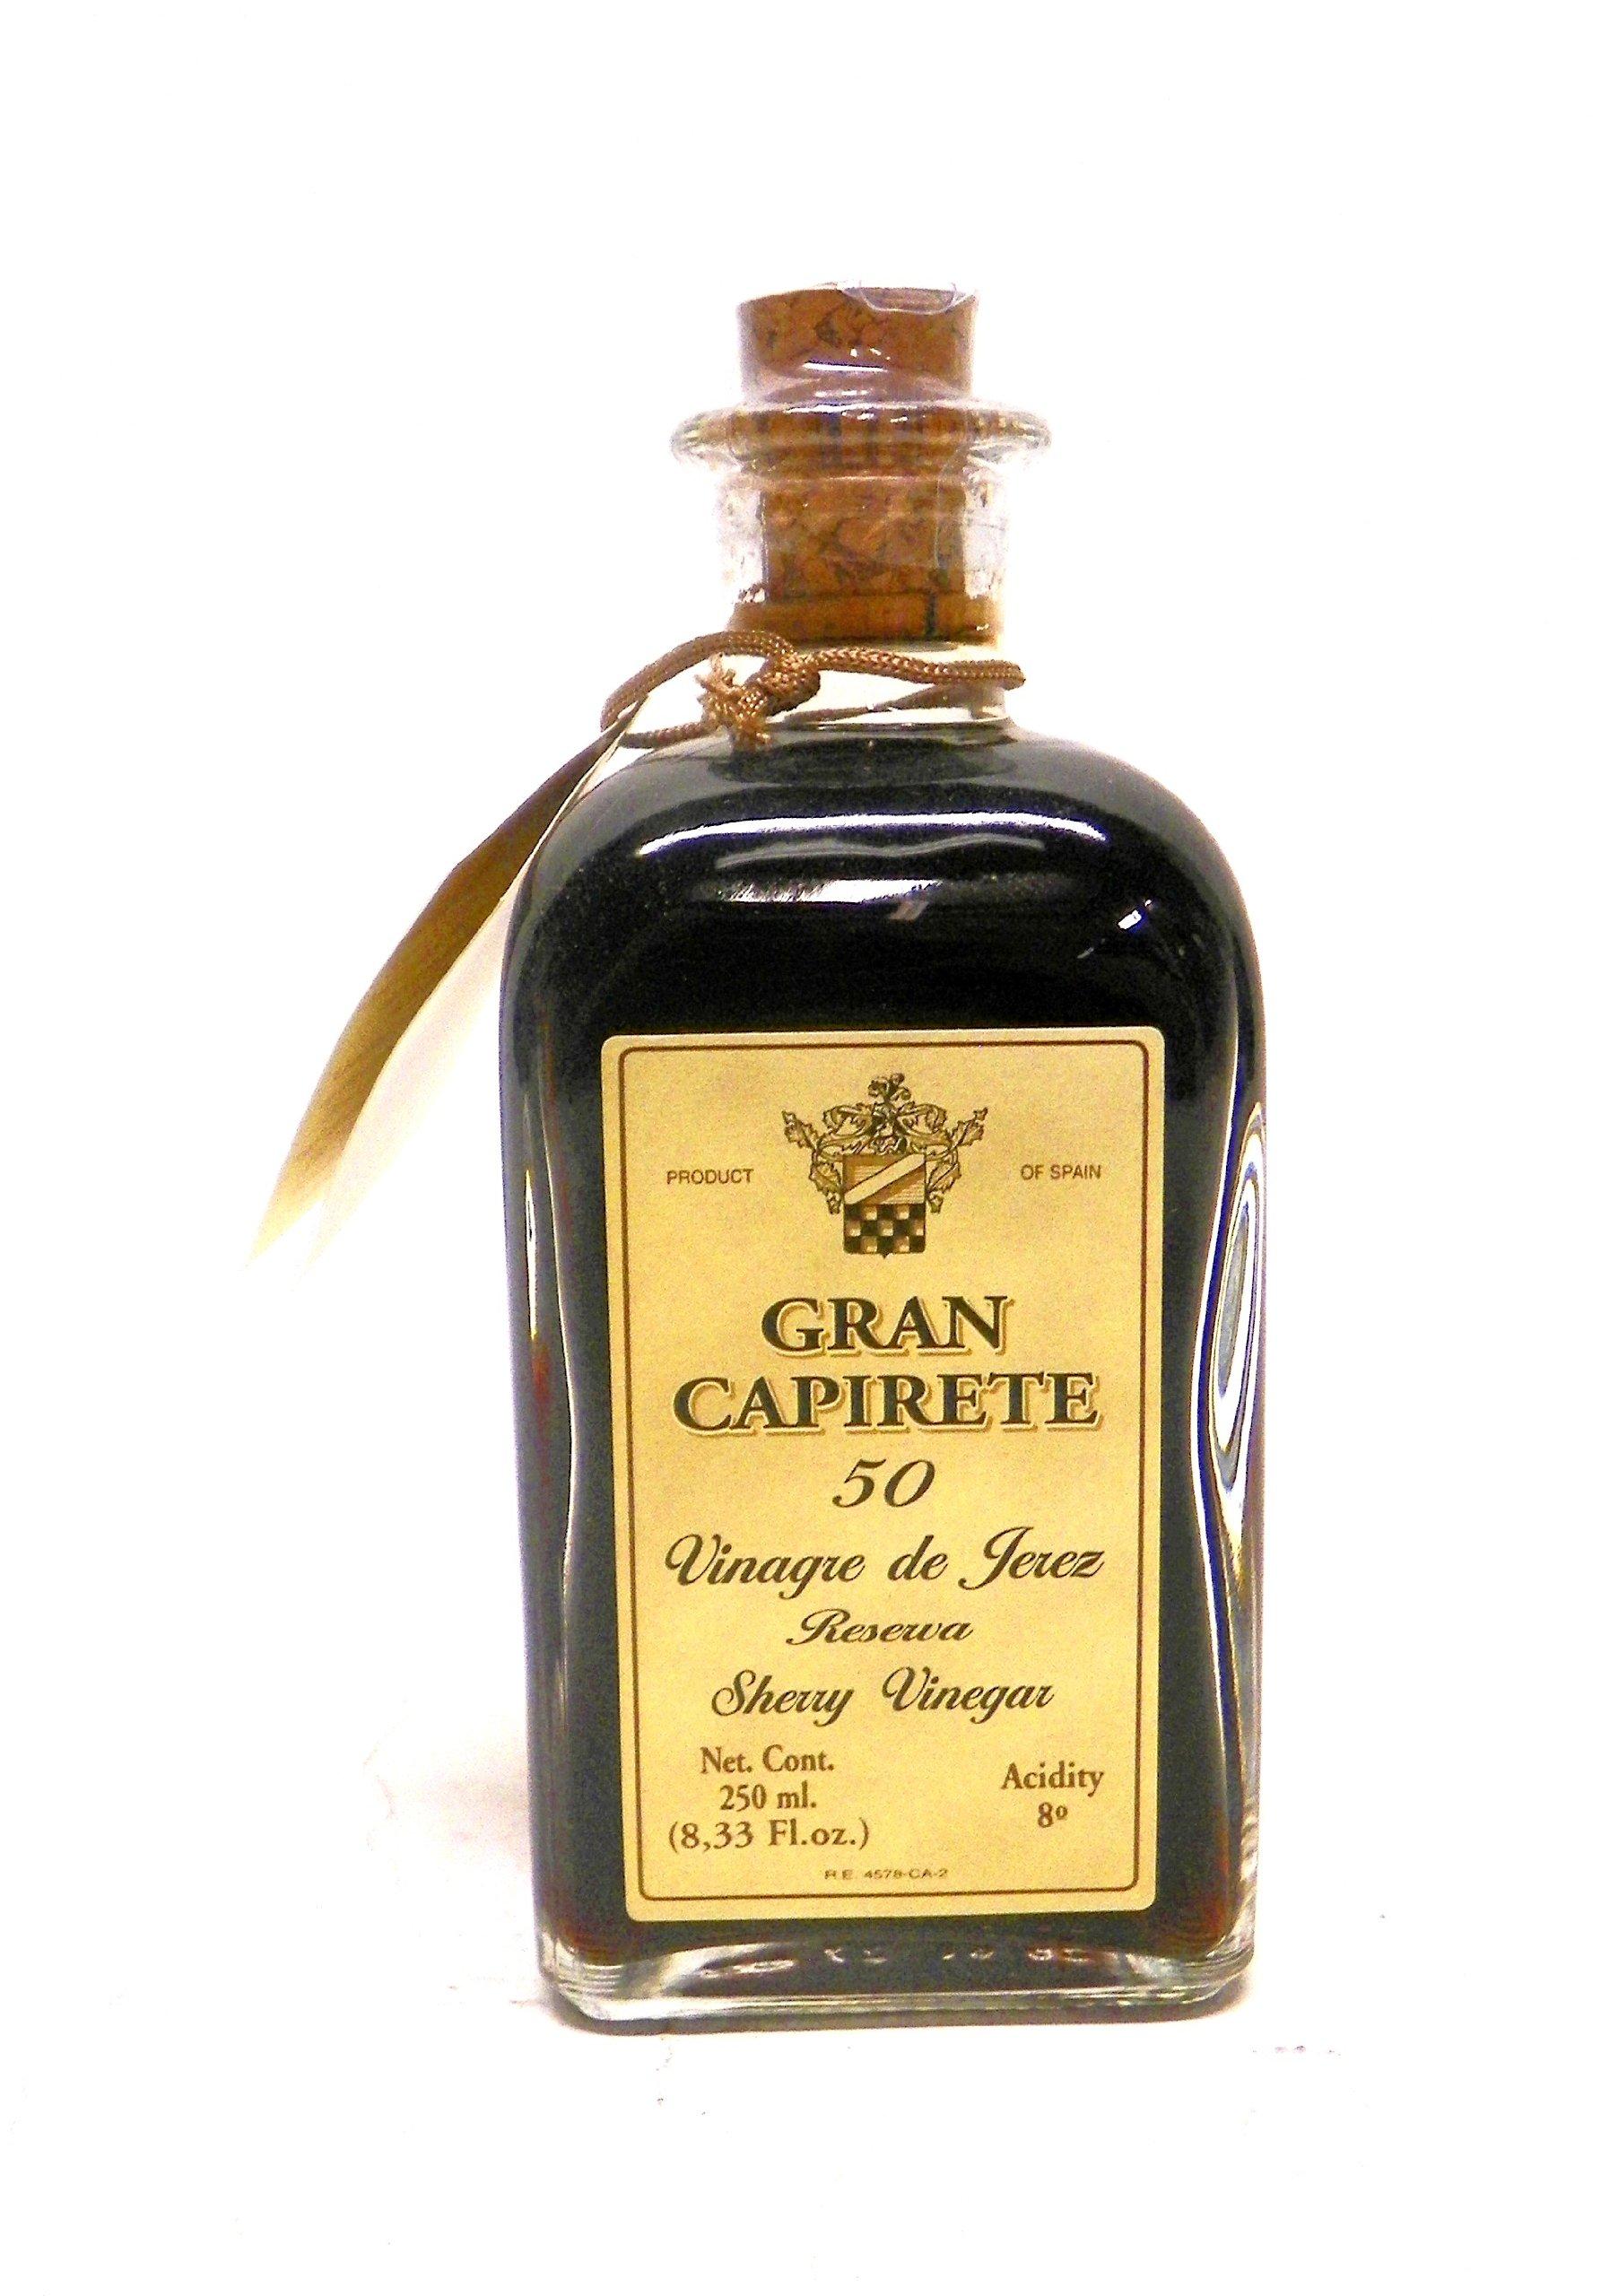 Gran Capirete Sherry Vinegar Vinegret De Jerez 50 Years Vintage, 8.3-Ounce 1 An 8.3-ounce bottle Aged in barrels of American oak Elaborated following the traditional solera system for a unique taste